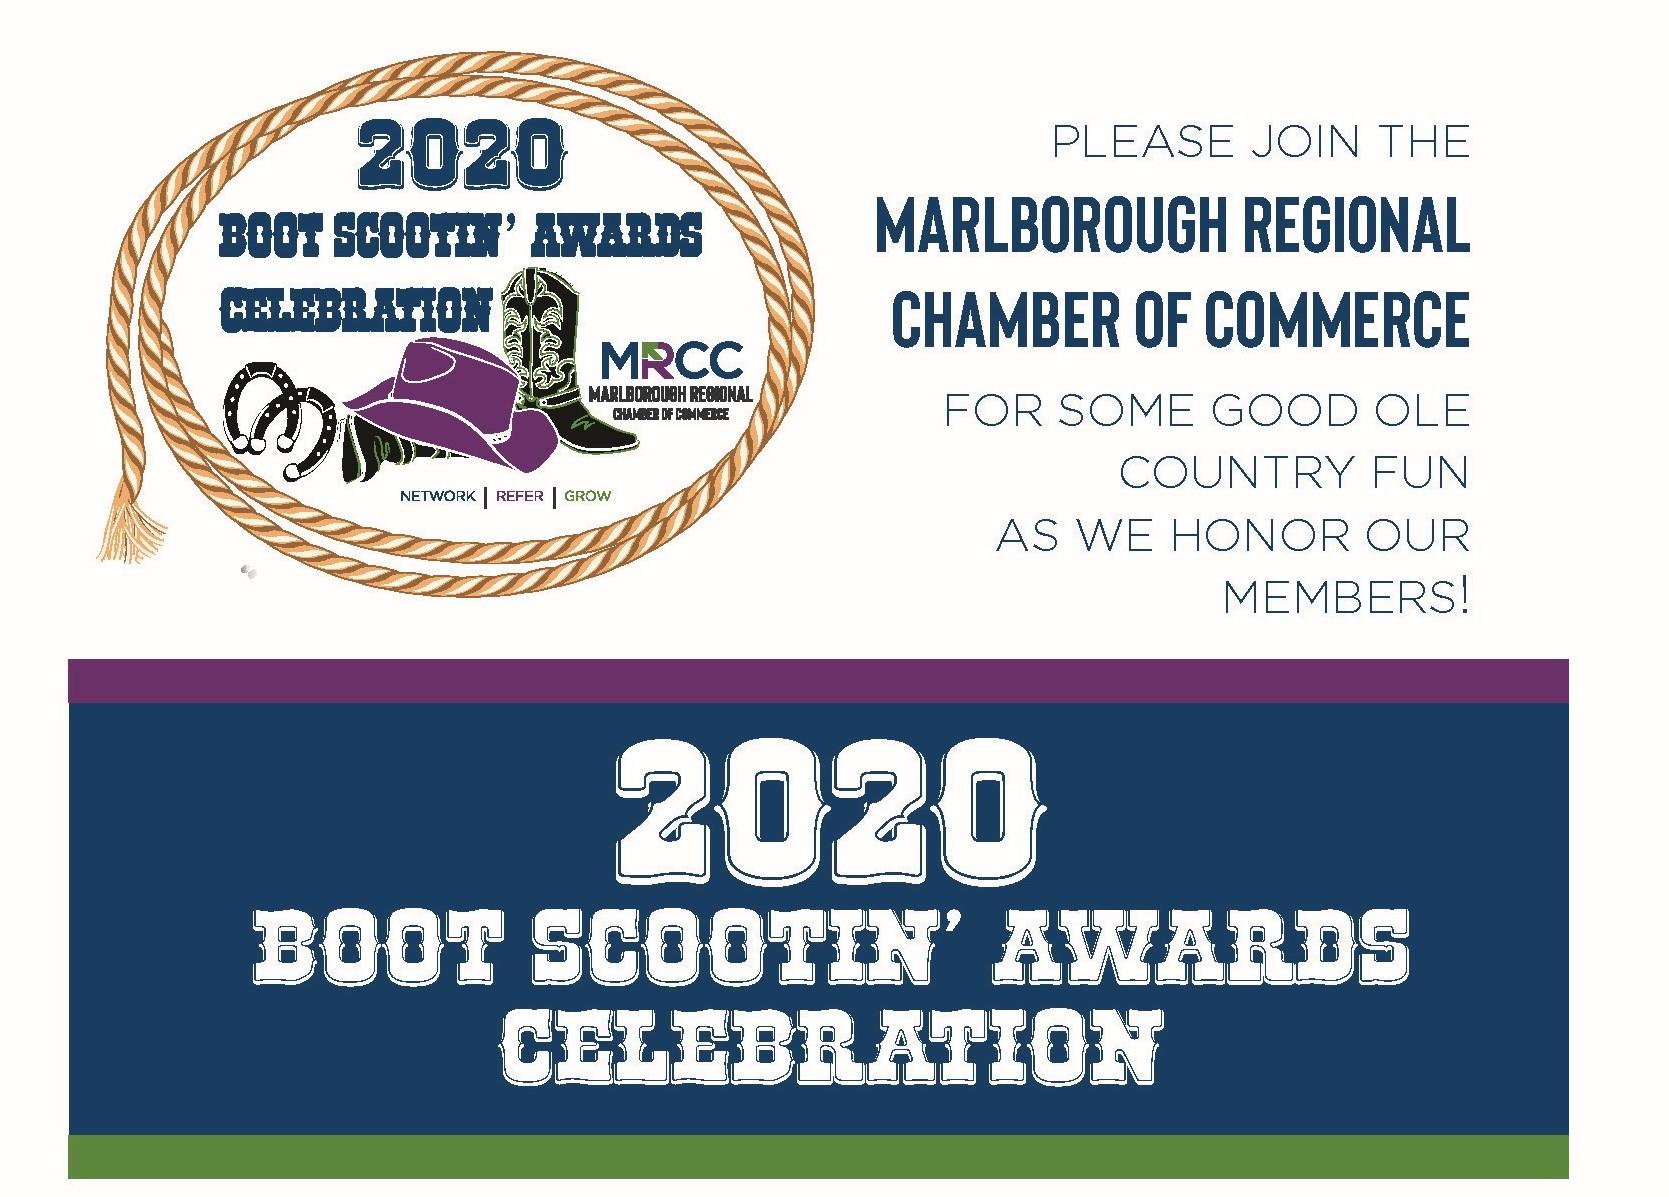 2020 Boot Scootin' Awards Celebration